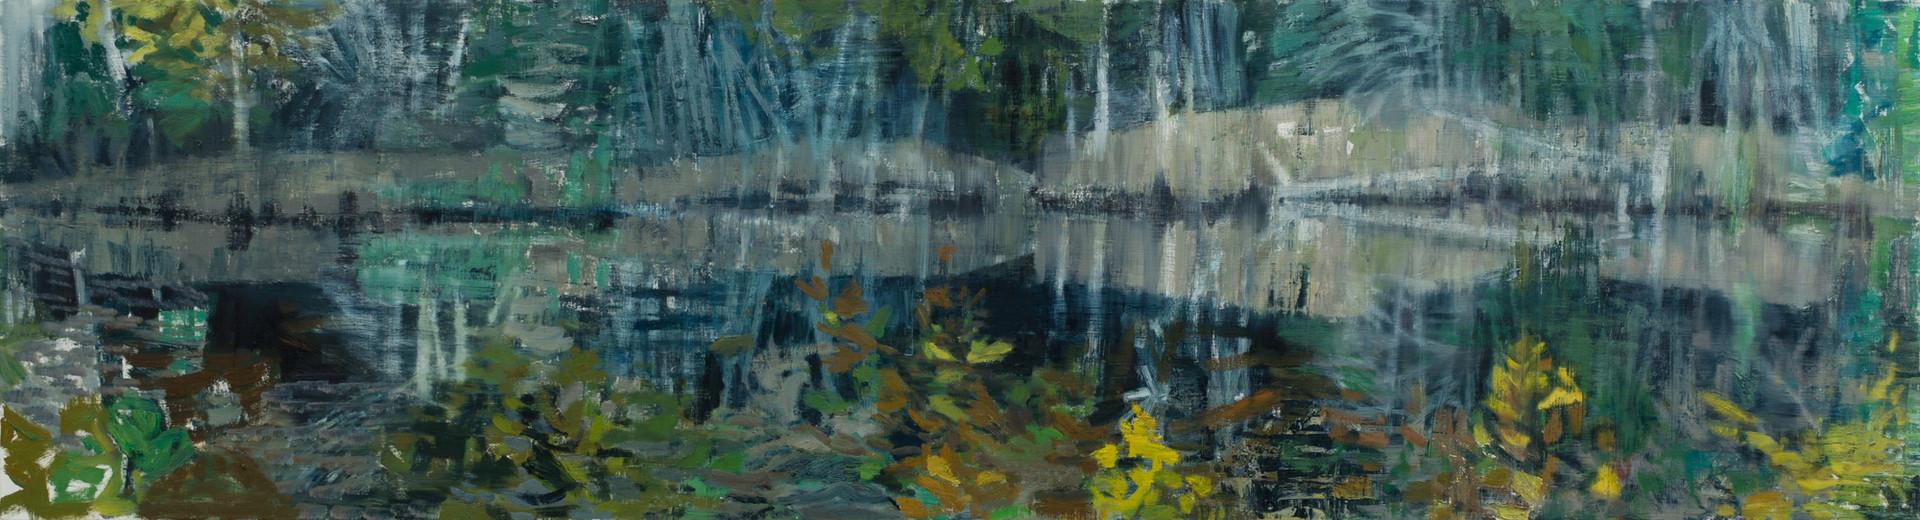 Pool - Pretty Marsh 2019 oil on linen 65 x 240cm